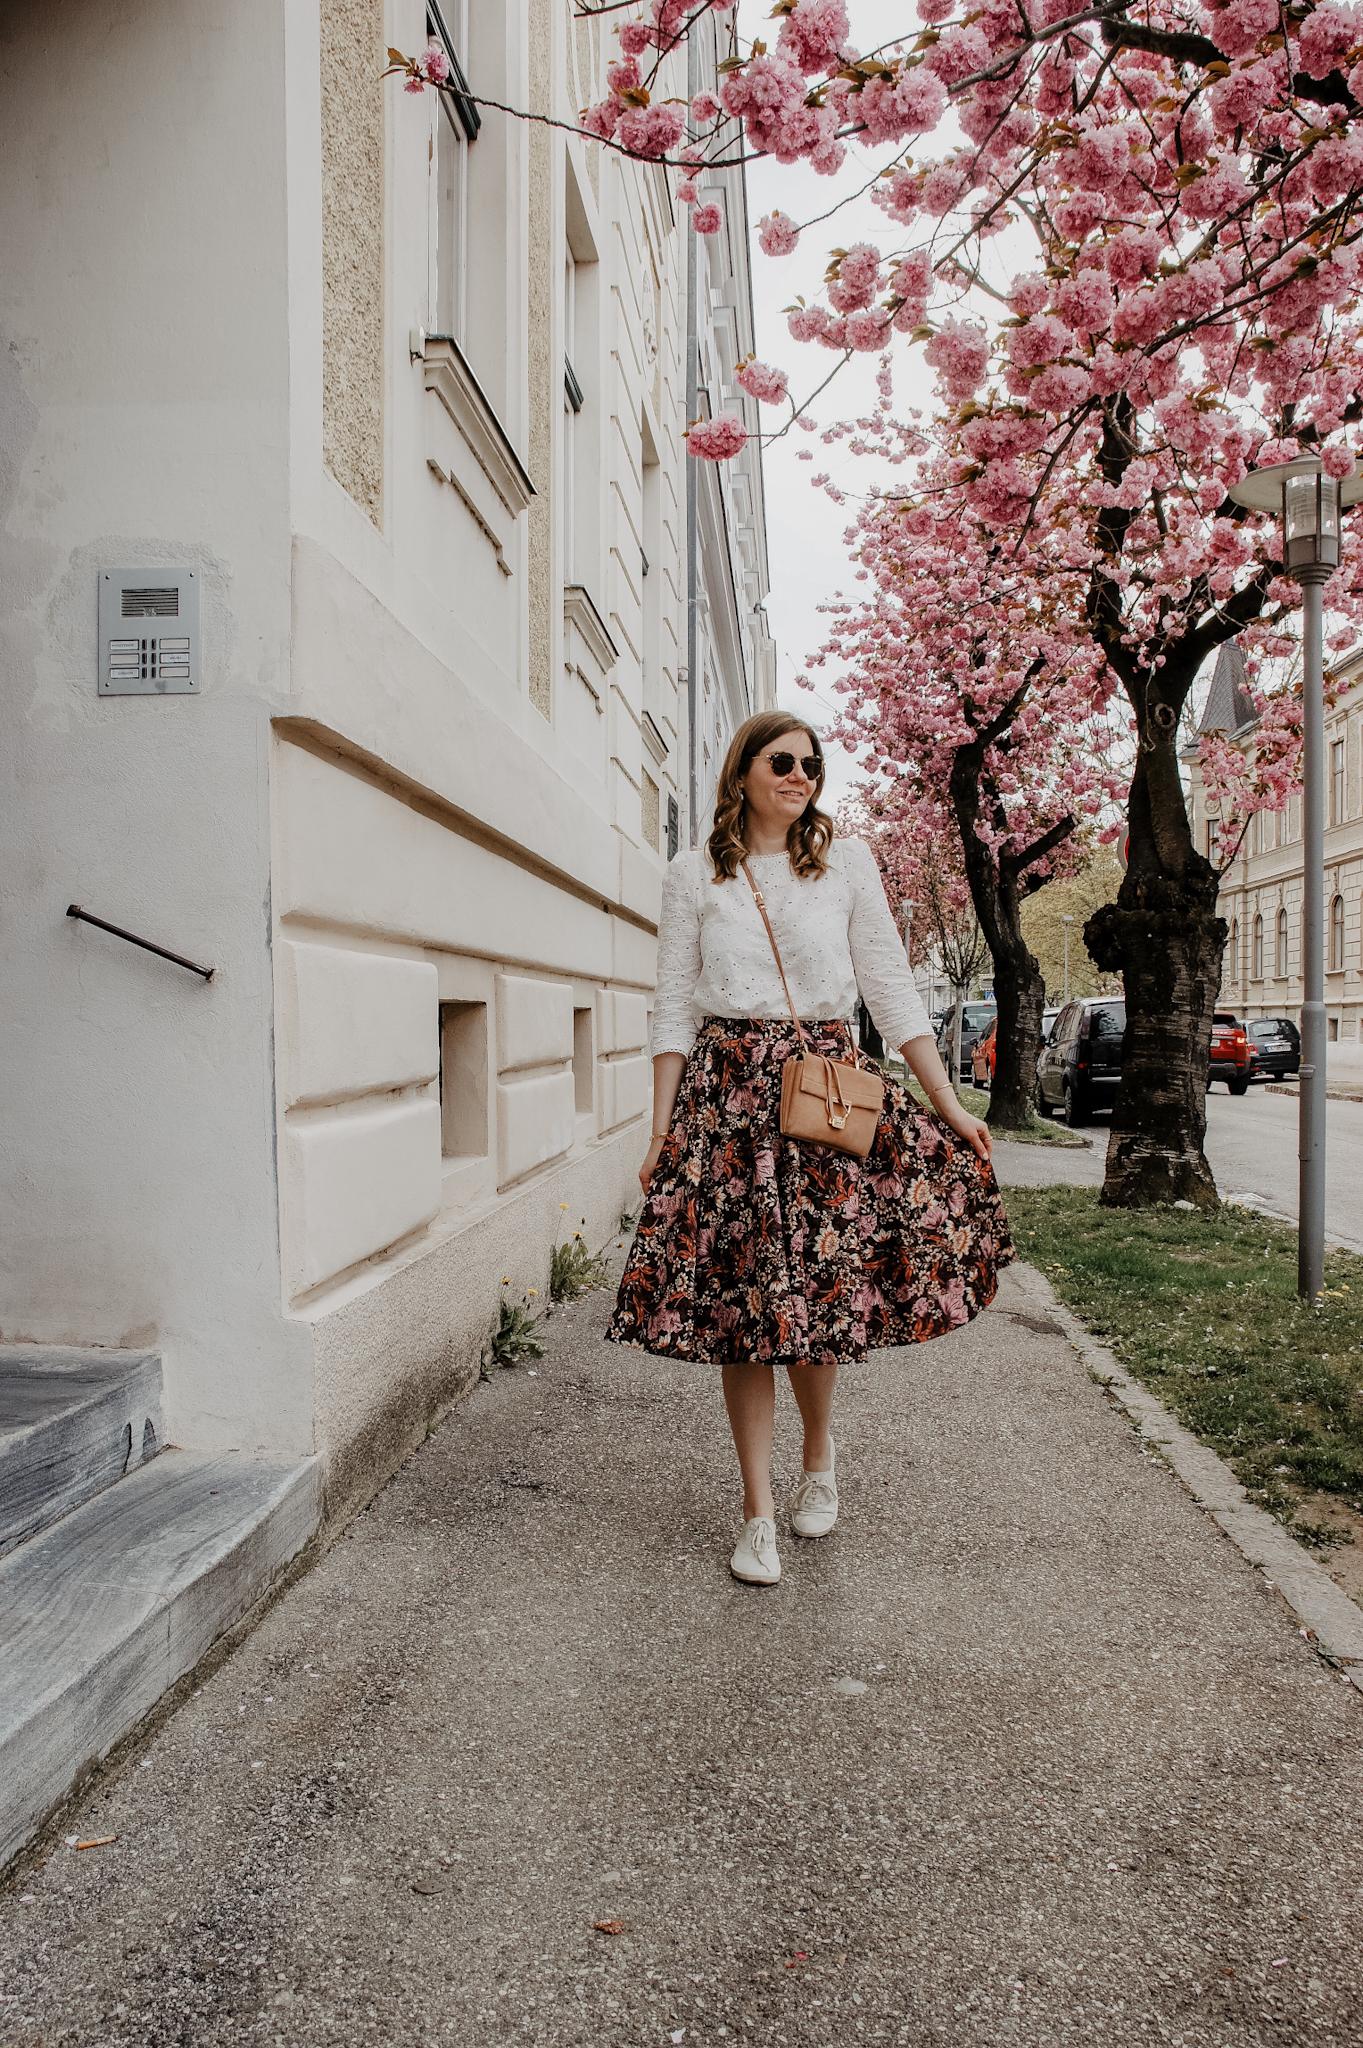 flower midi skirt, blouse, Marie Zelie, Coccinelle Arlettis , spring outfit, cherry blossom